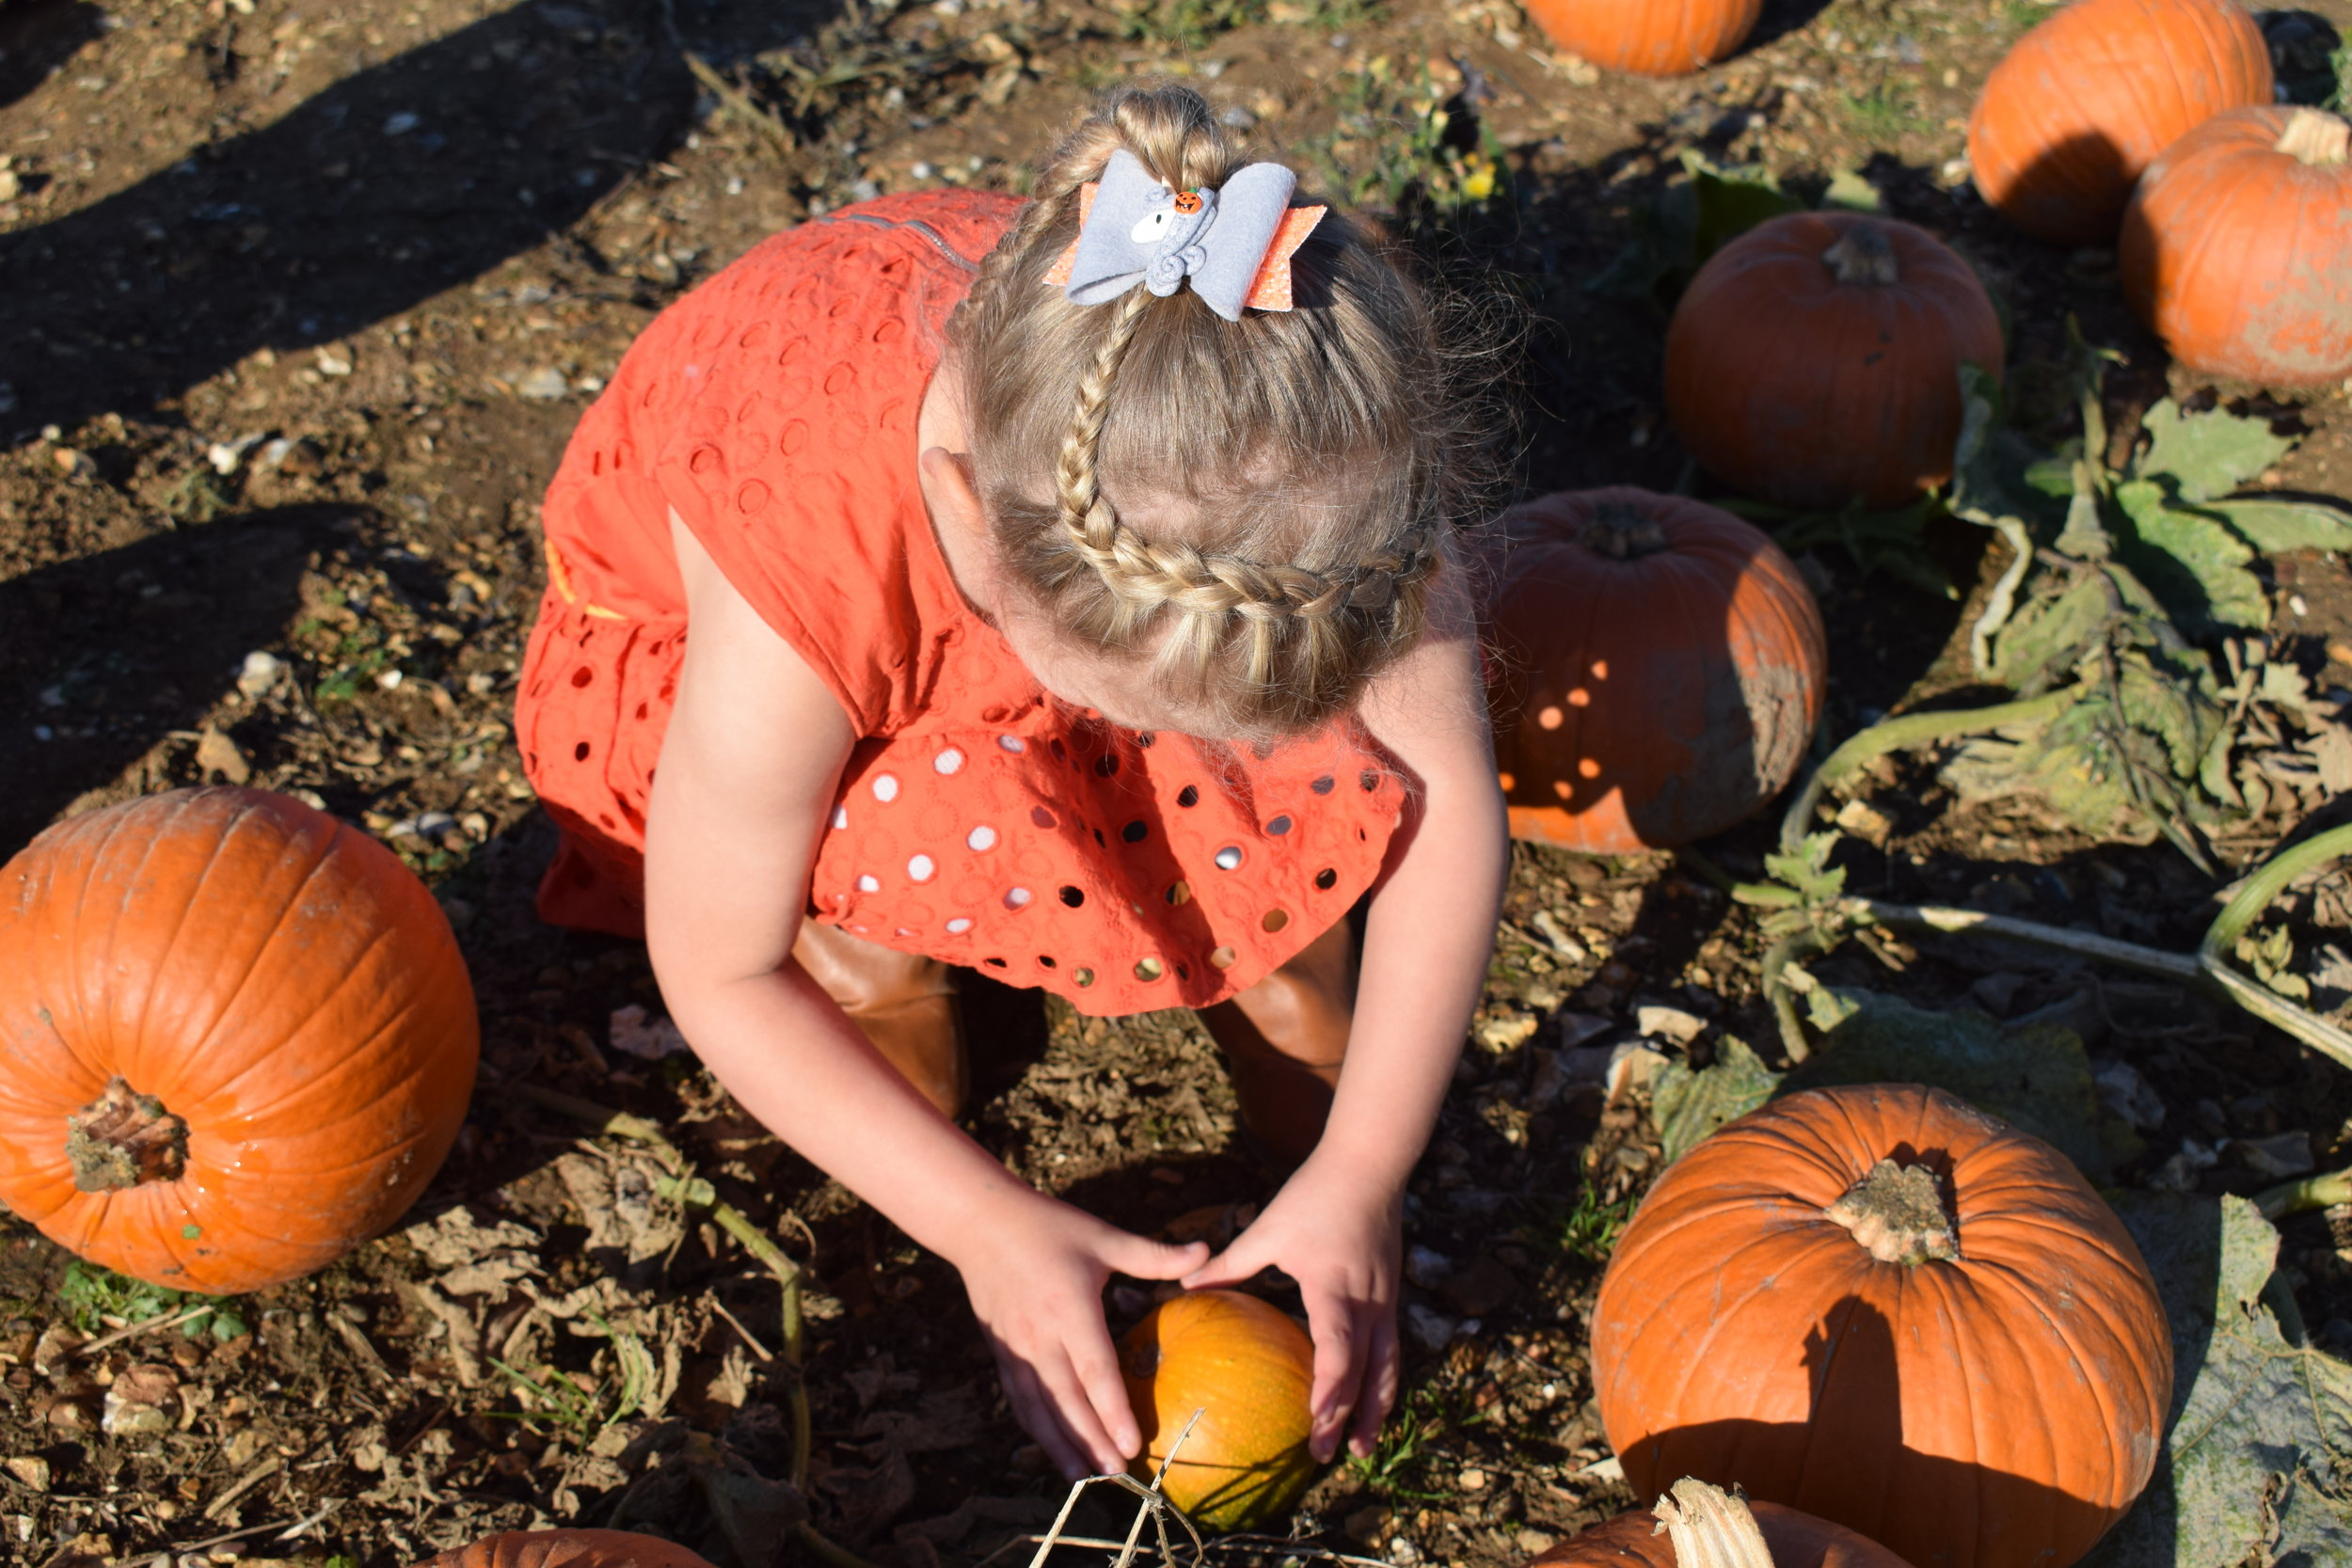 Squidgy pumpkin picking at The Pop-Up Farm pumpkin patch